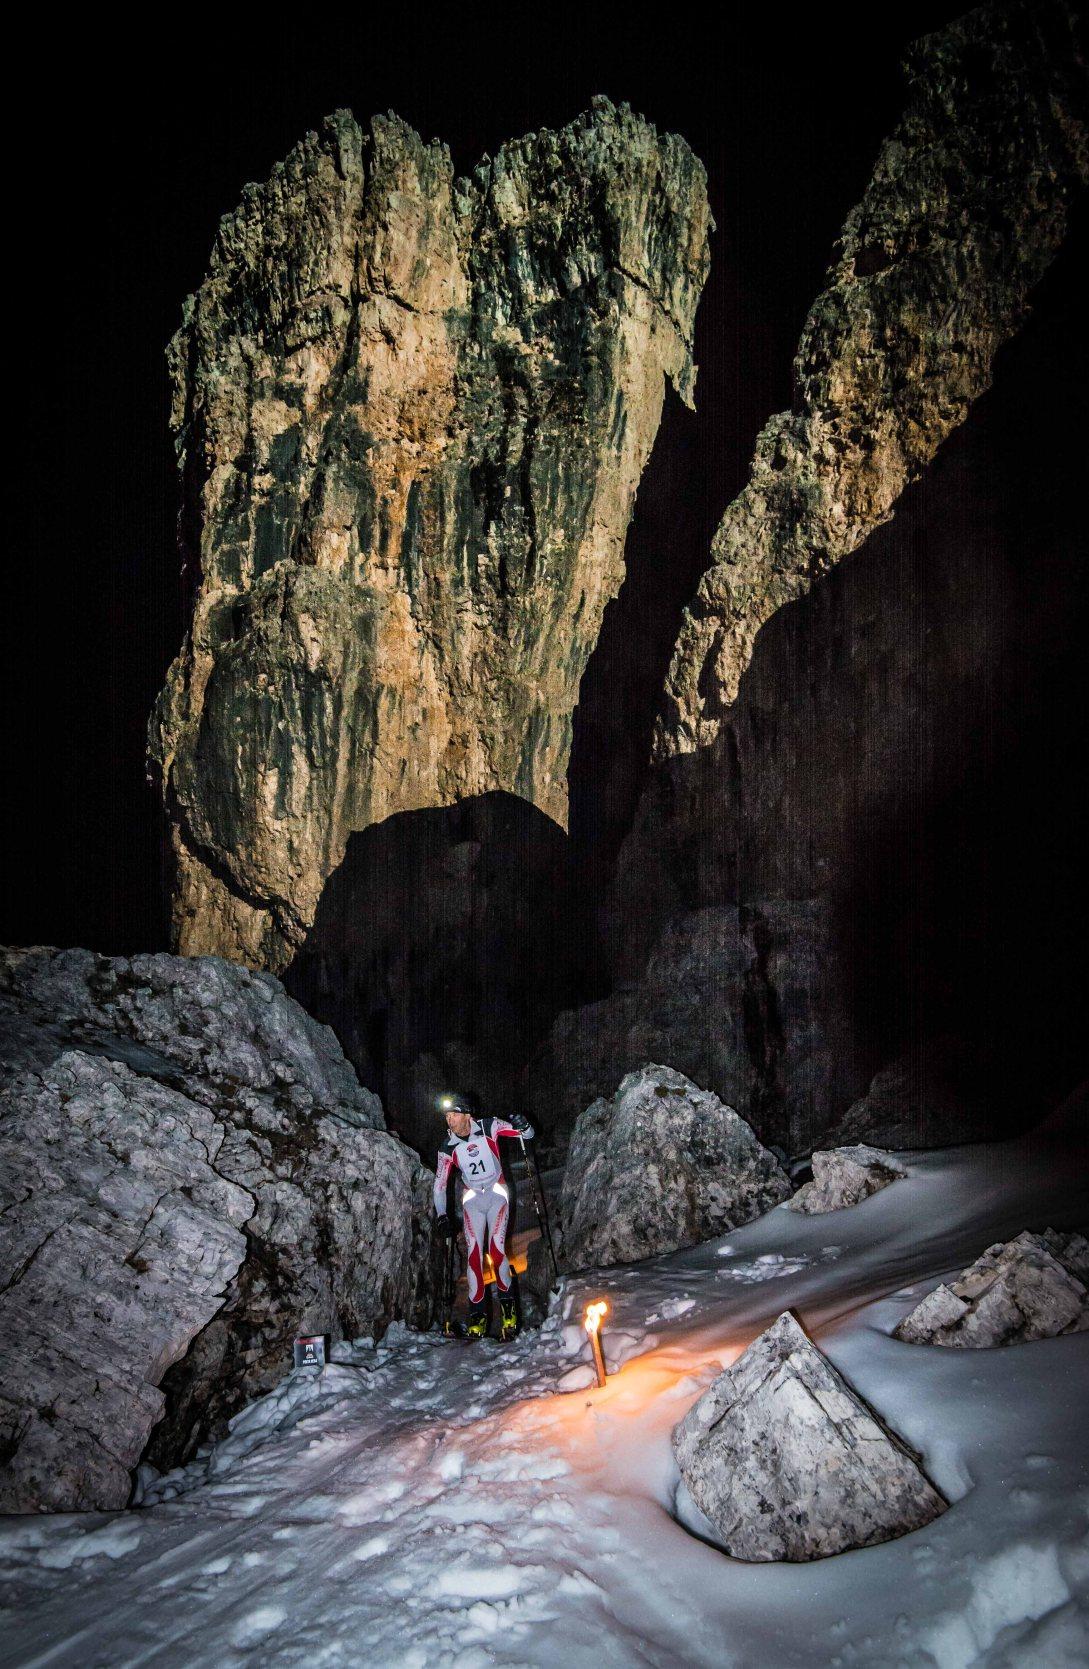 Scialpinismo 5 Torri, passaggio sotto la quarta torre